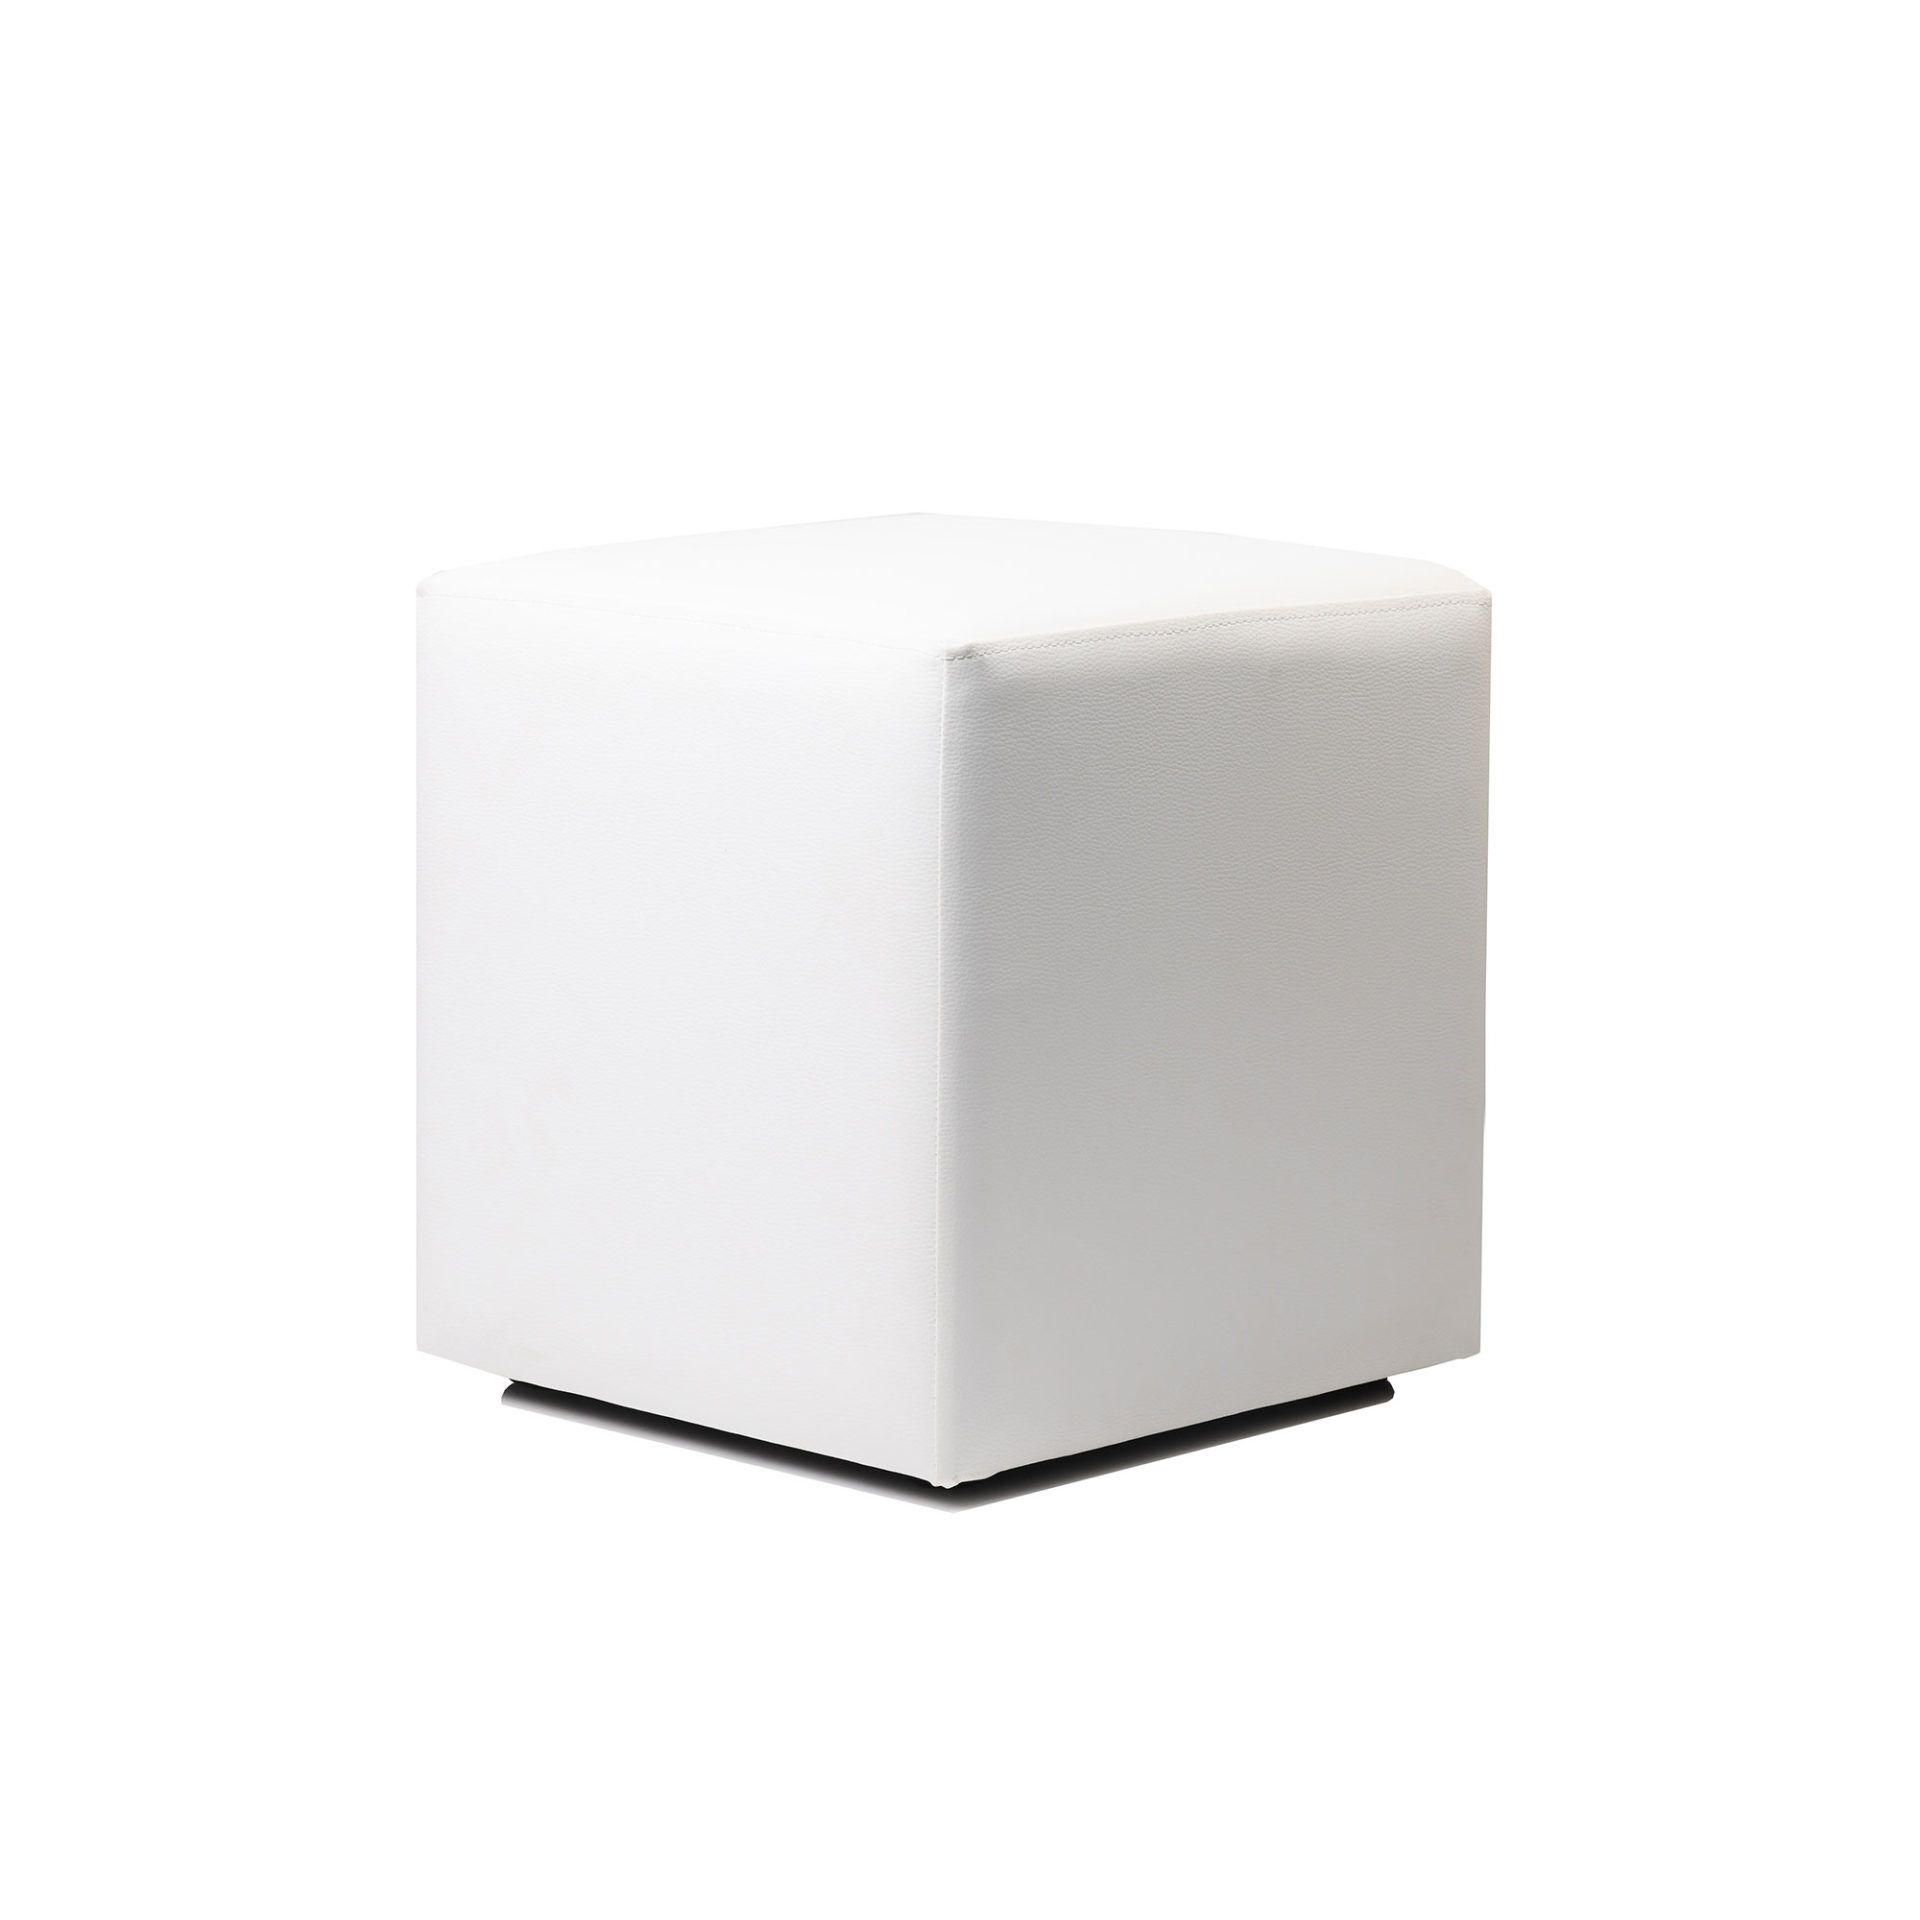 ottoman square white02